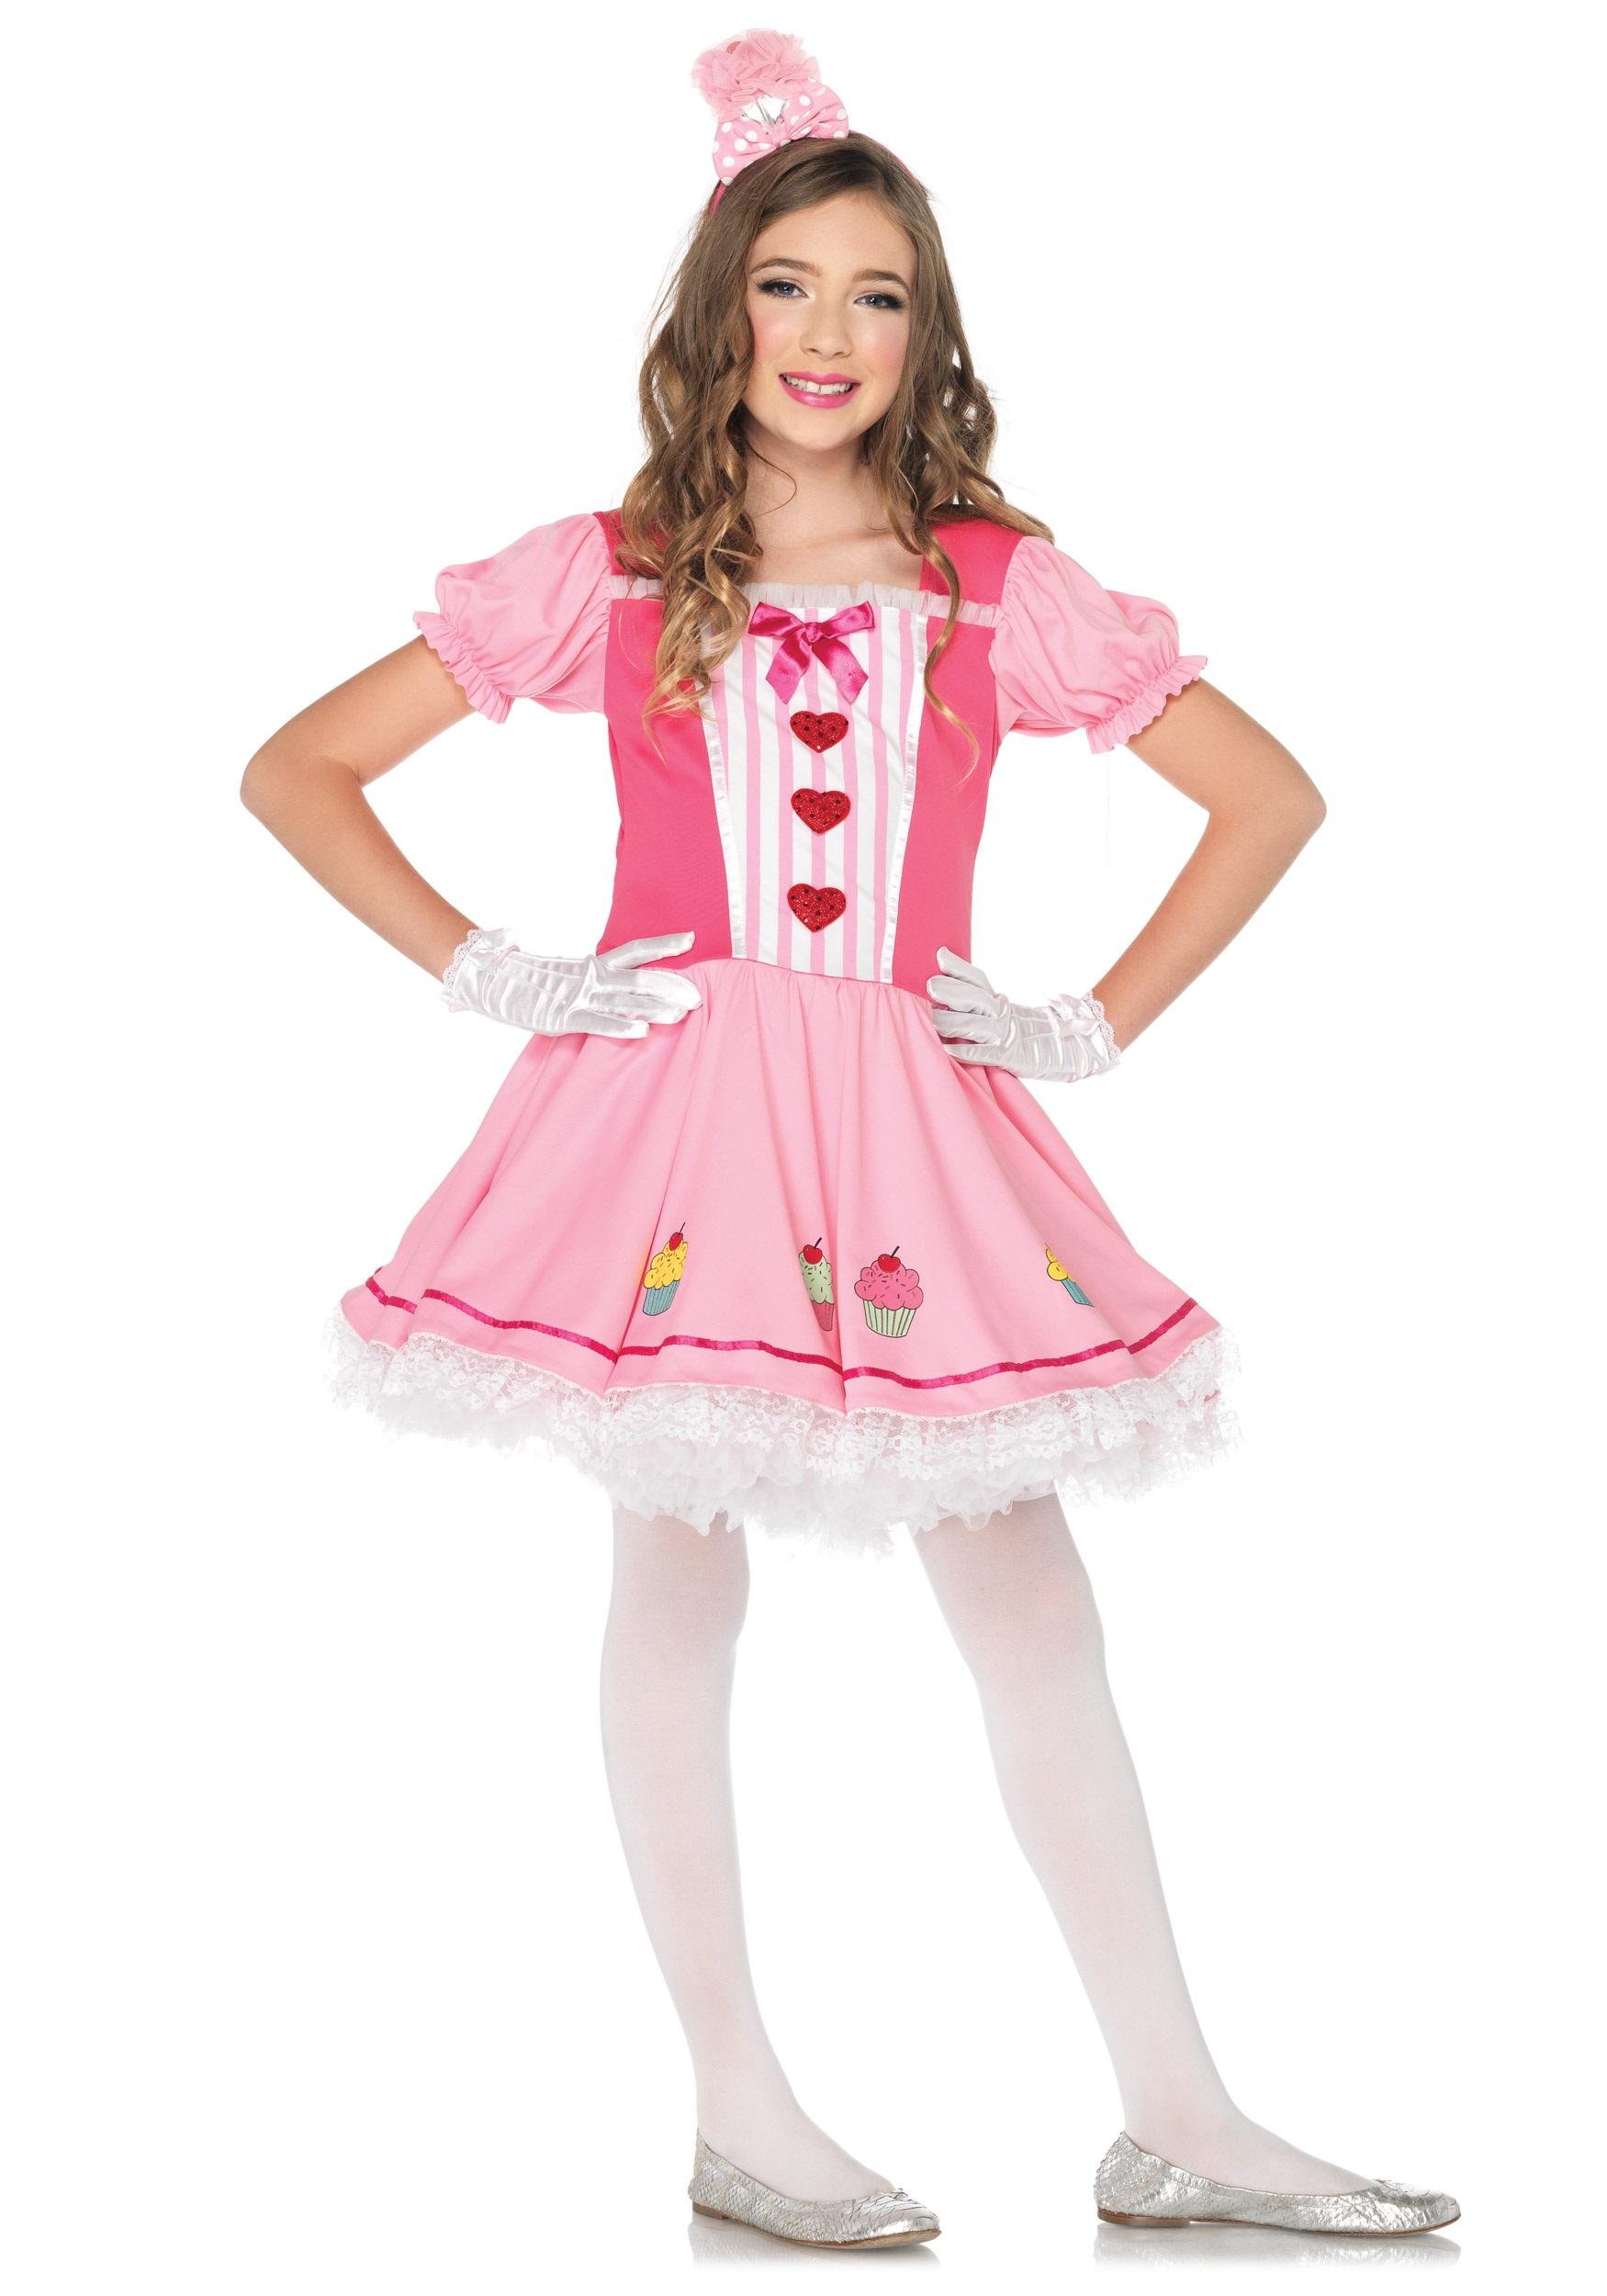 lil miss cupcake costume